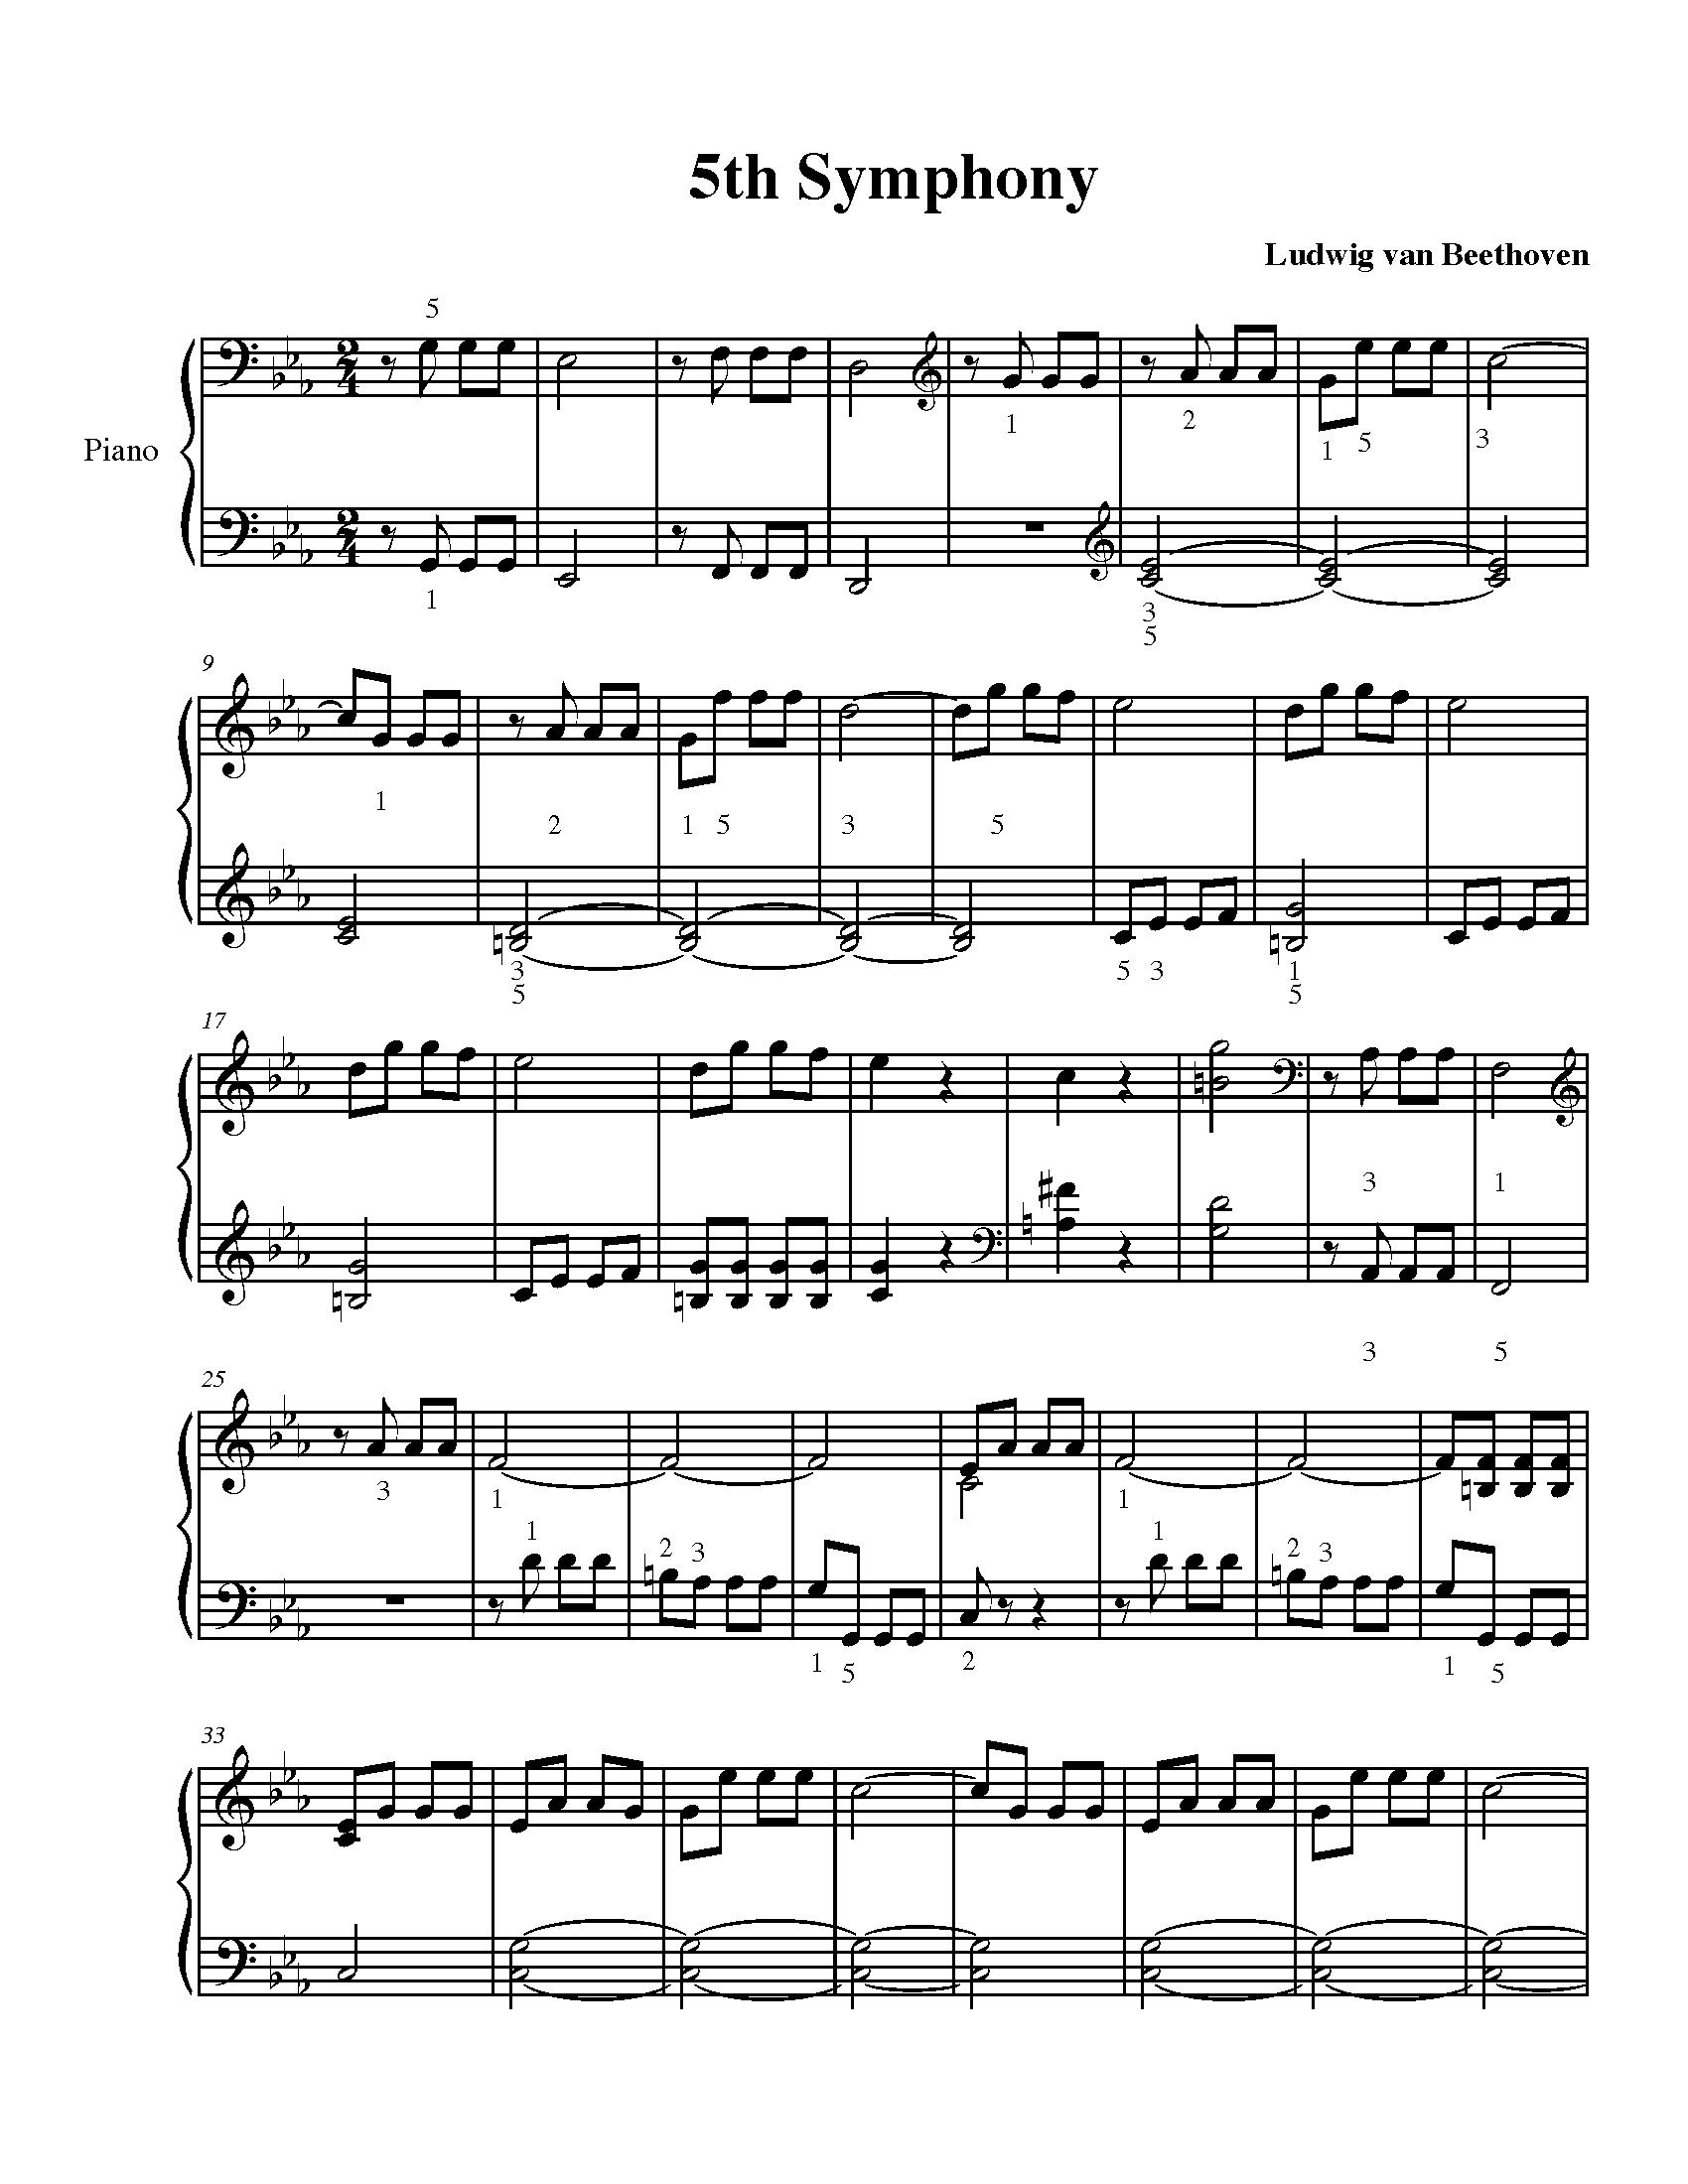 5Th Symphony beethoven's 5th symphony l2 - suzan stroud